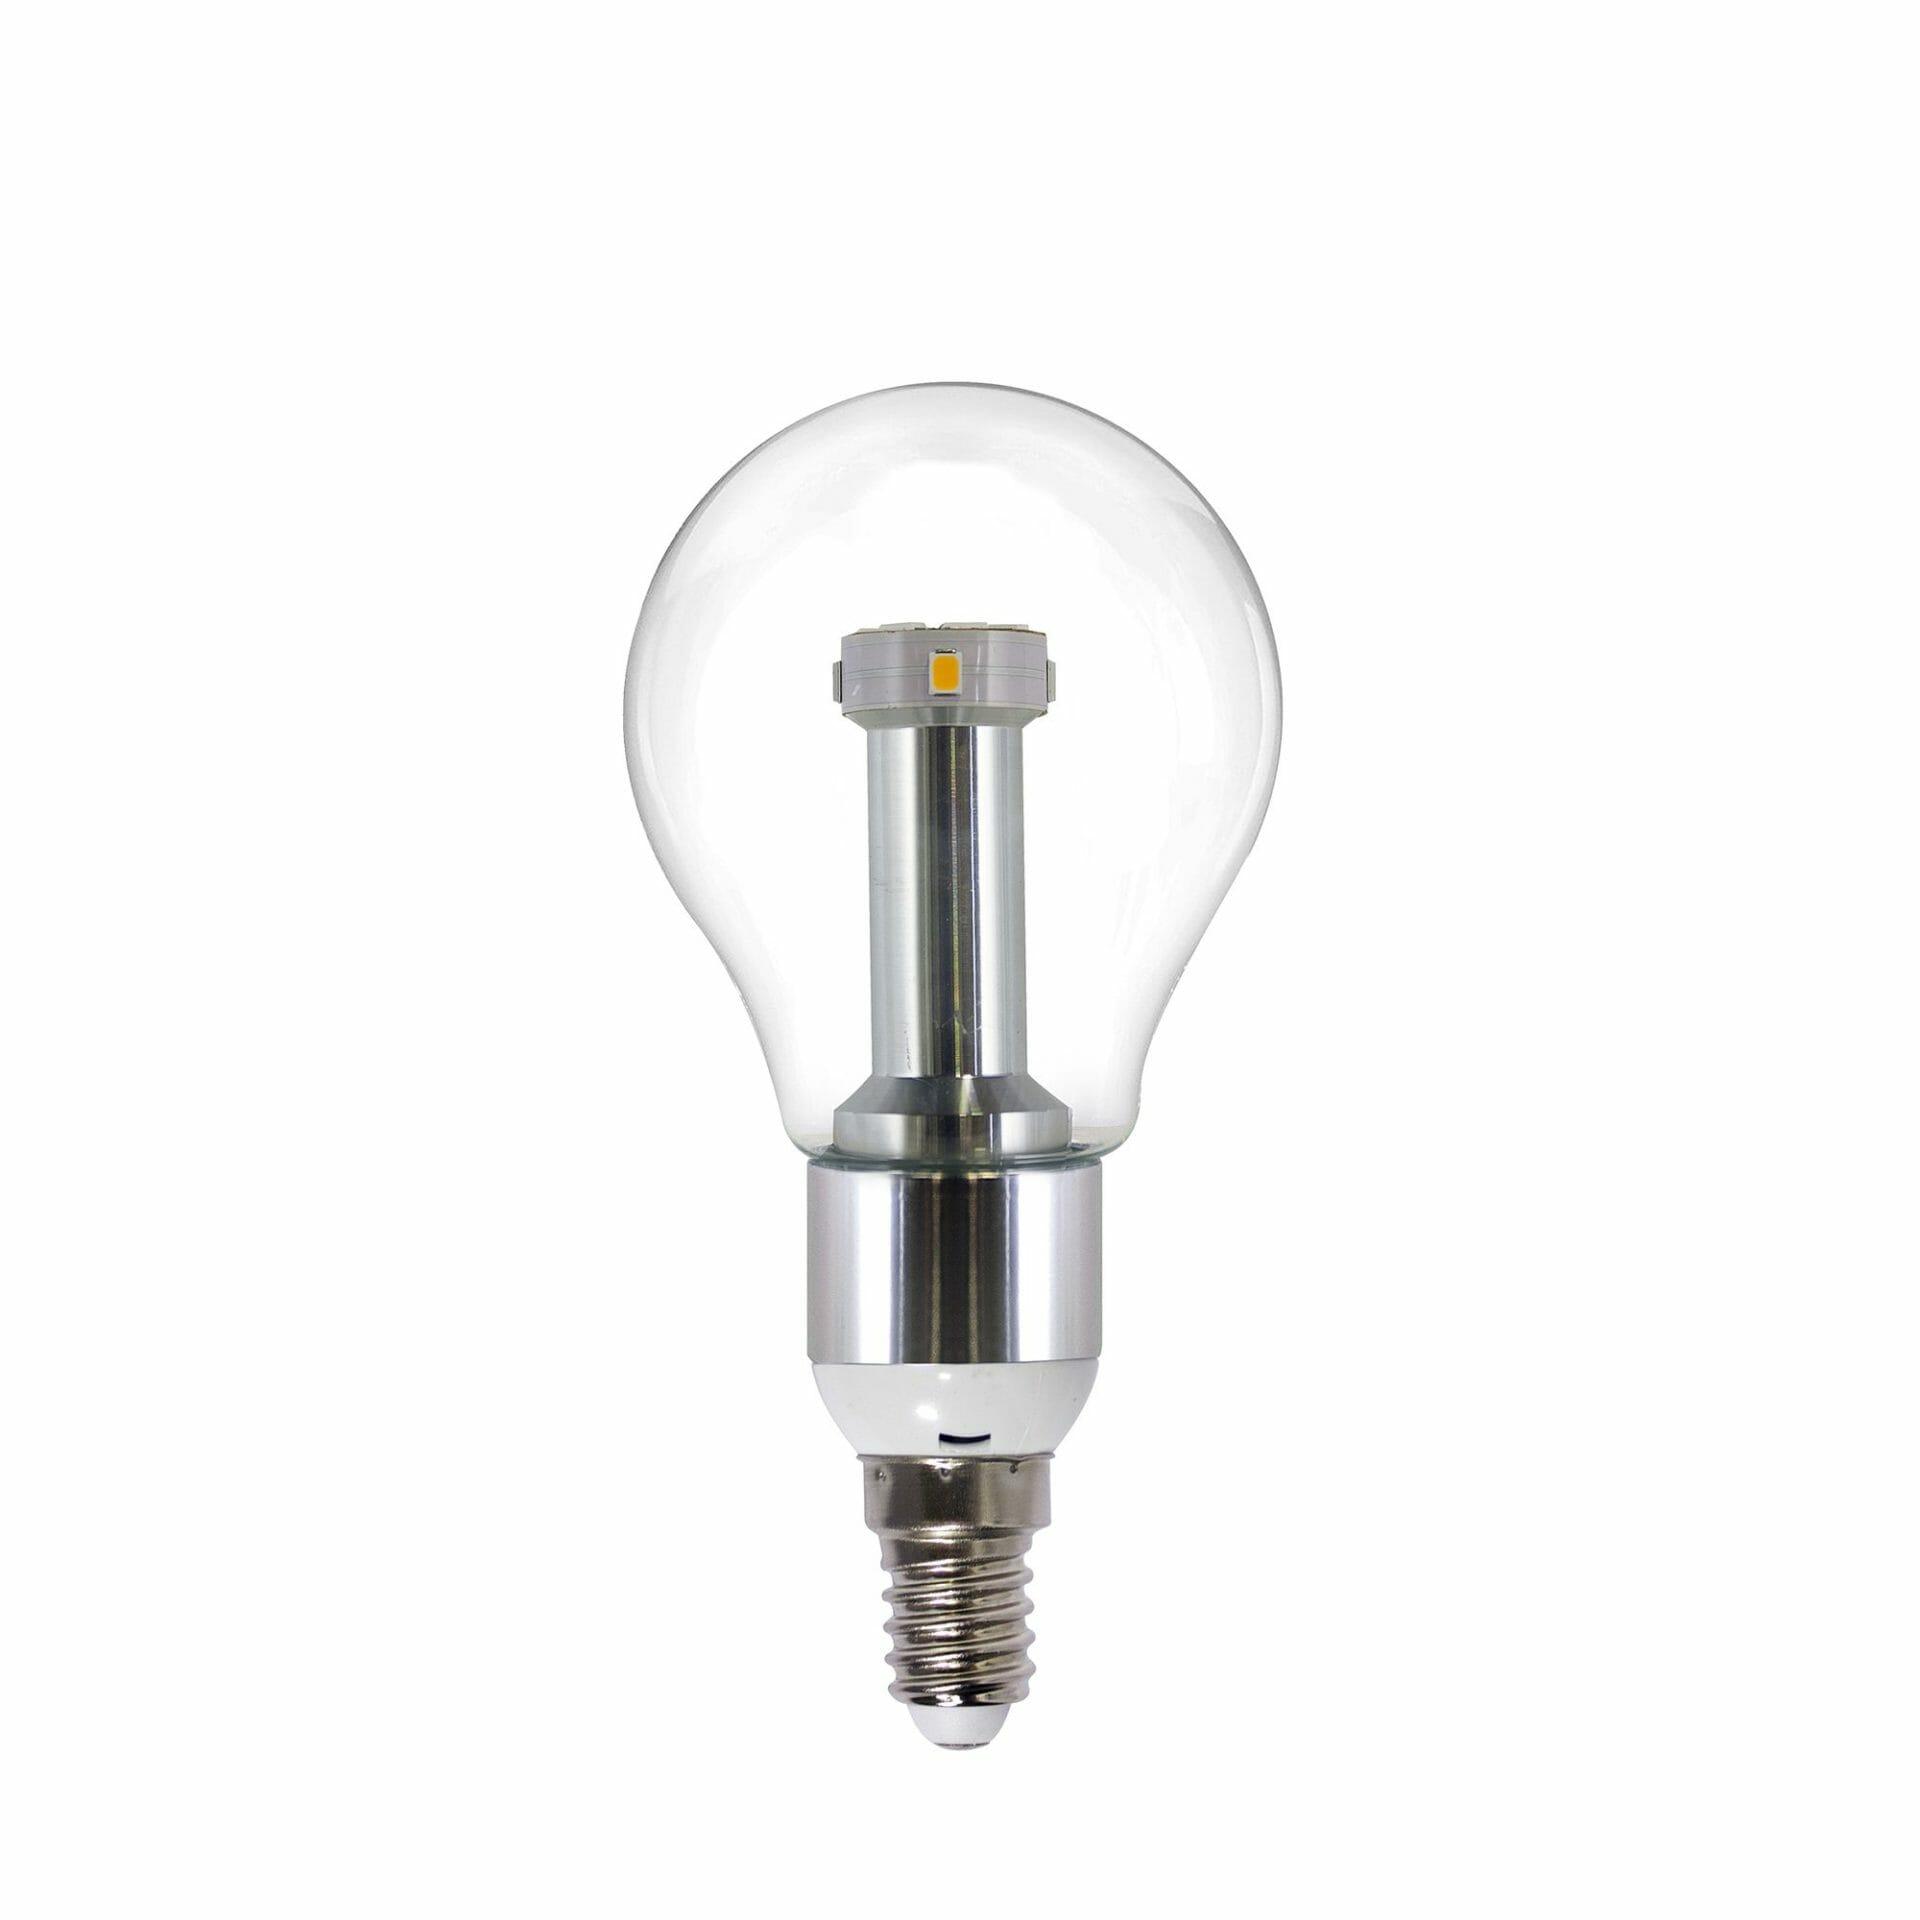 A60WW20W Solar Bulb